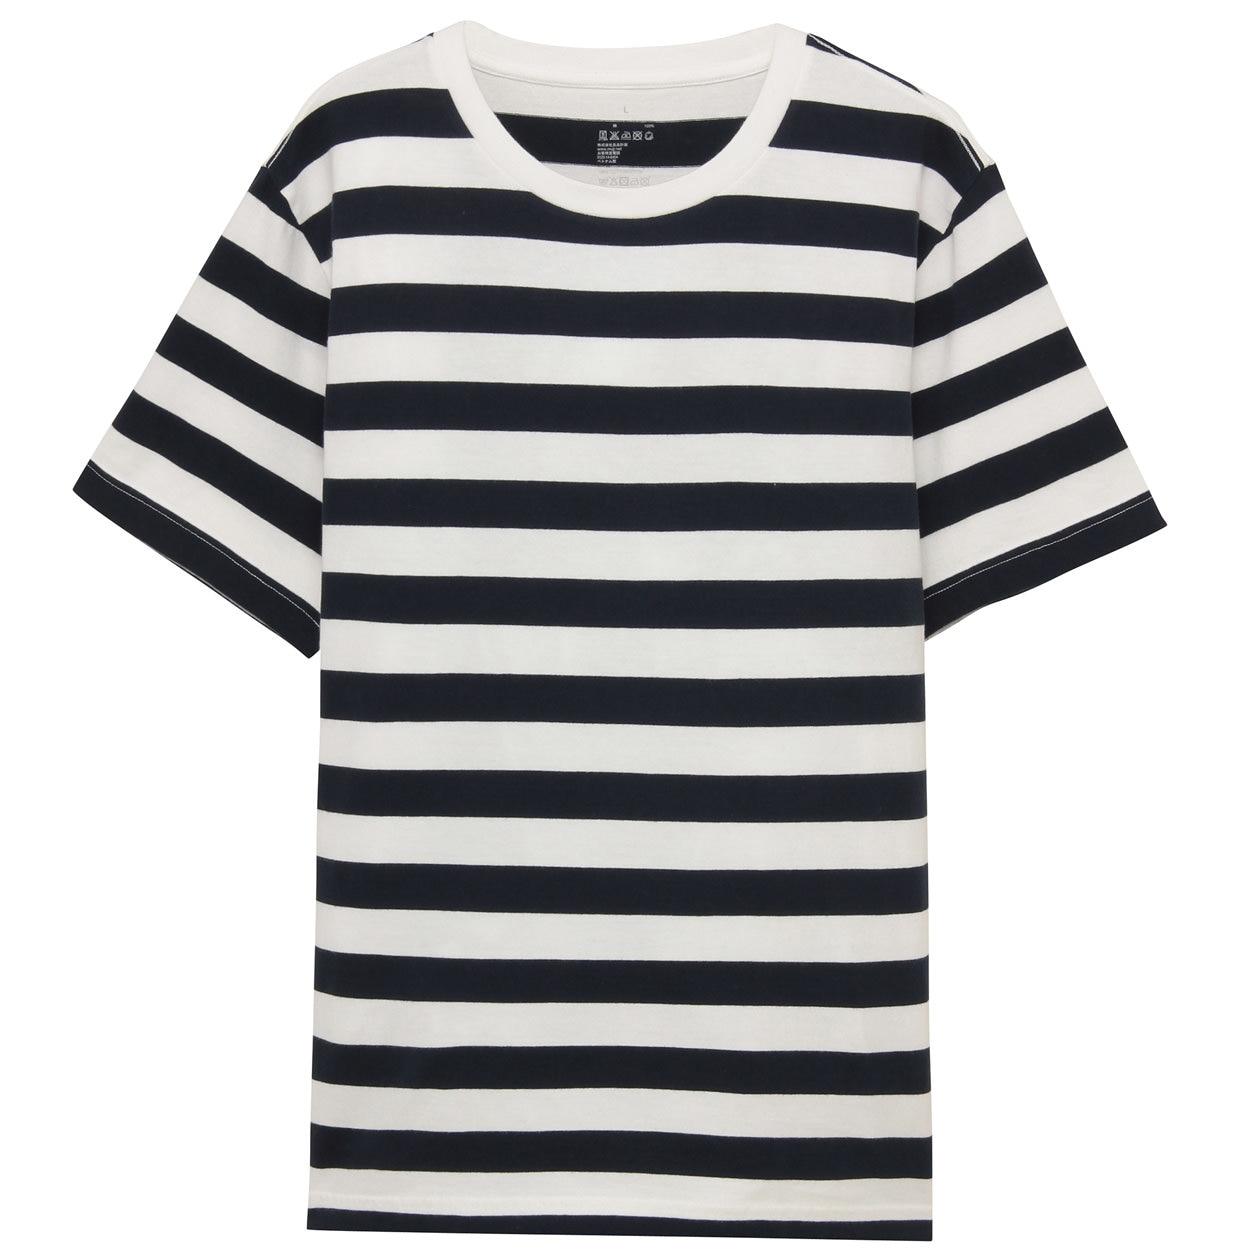 ogc border t shirt men s off white pattern muji. Black Bedroom Furniture Sets. Home Design Ideas